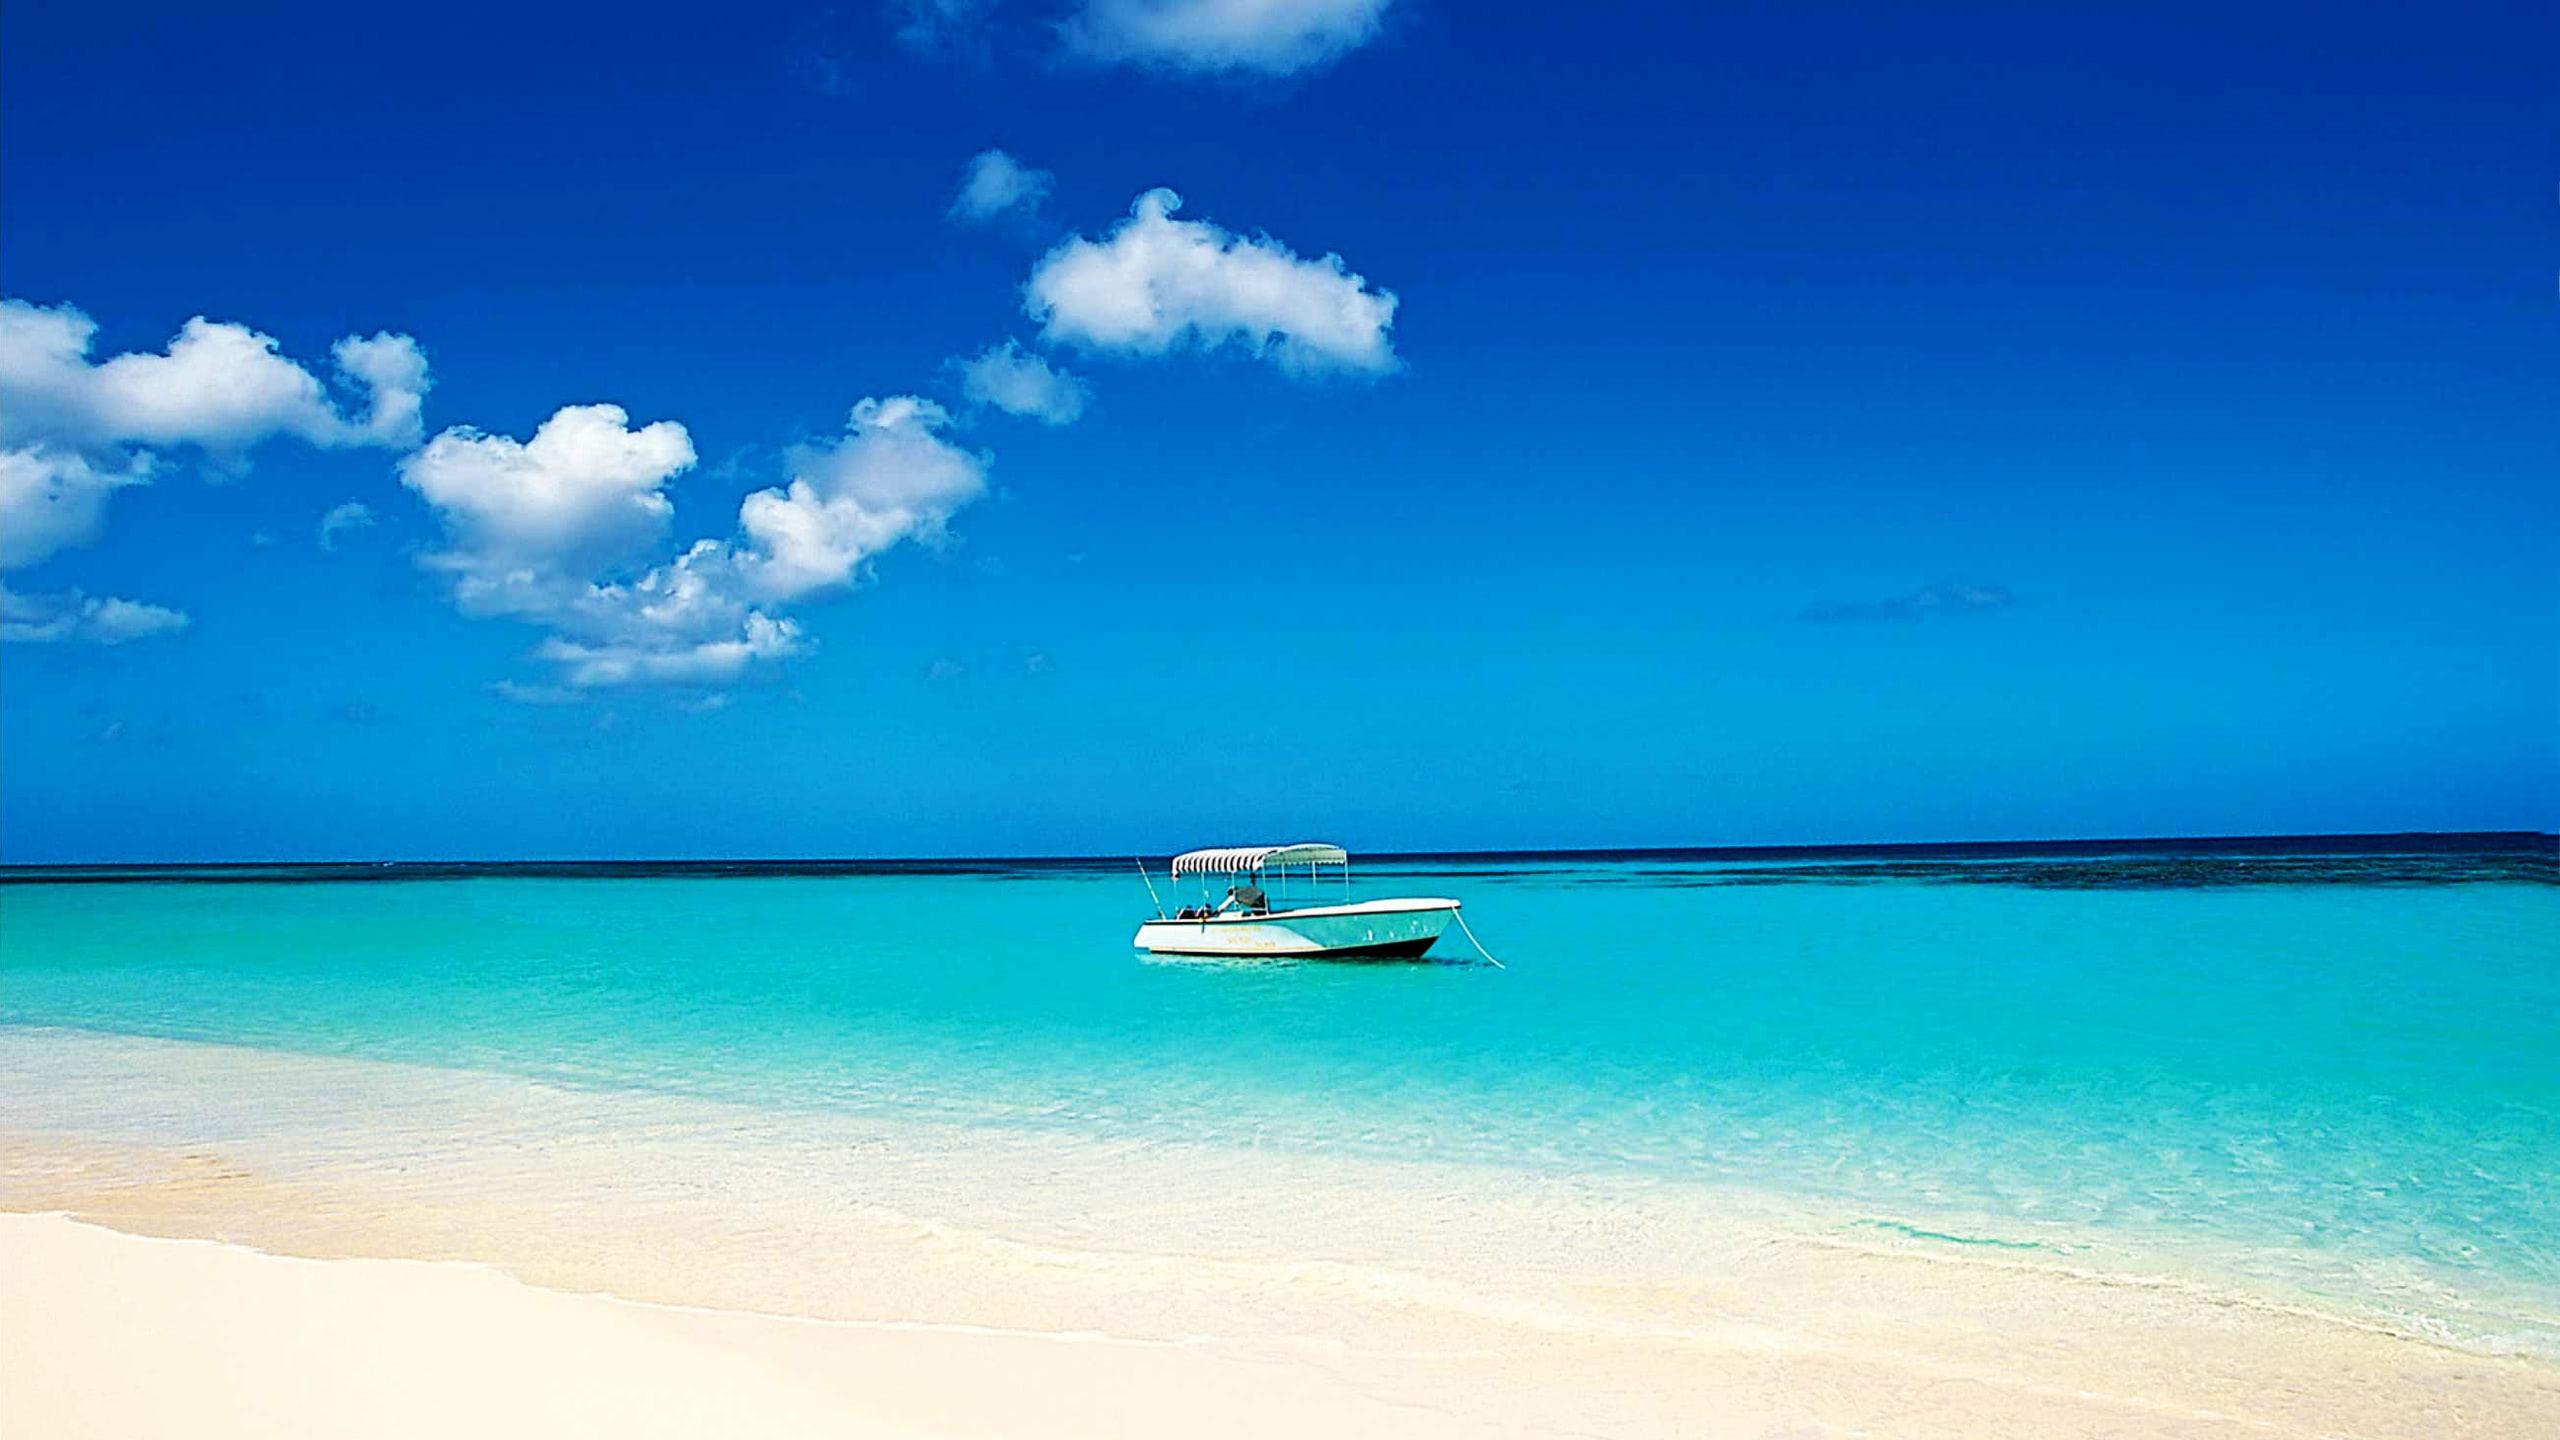 Download Samsung Beach Wallpaper Gallery: Tropical Beach Vacation Wallpaper